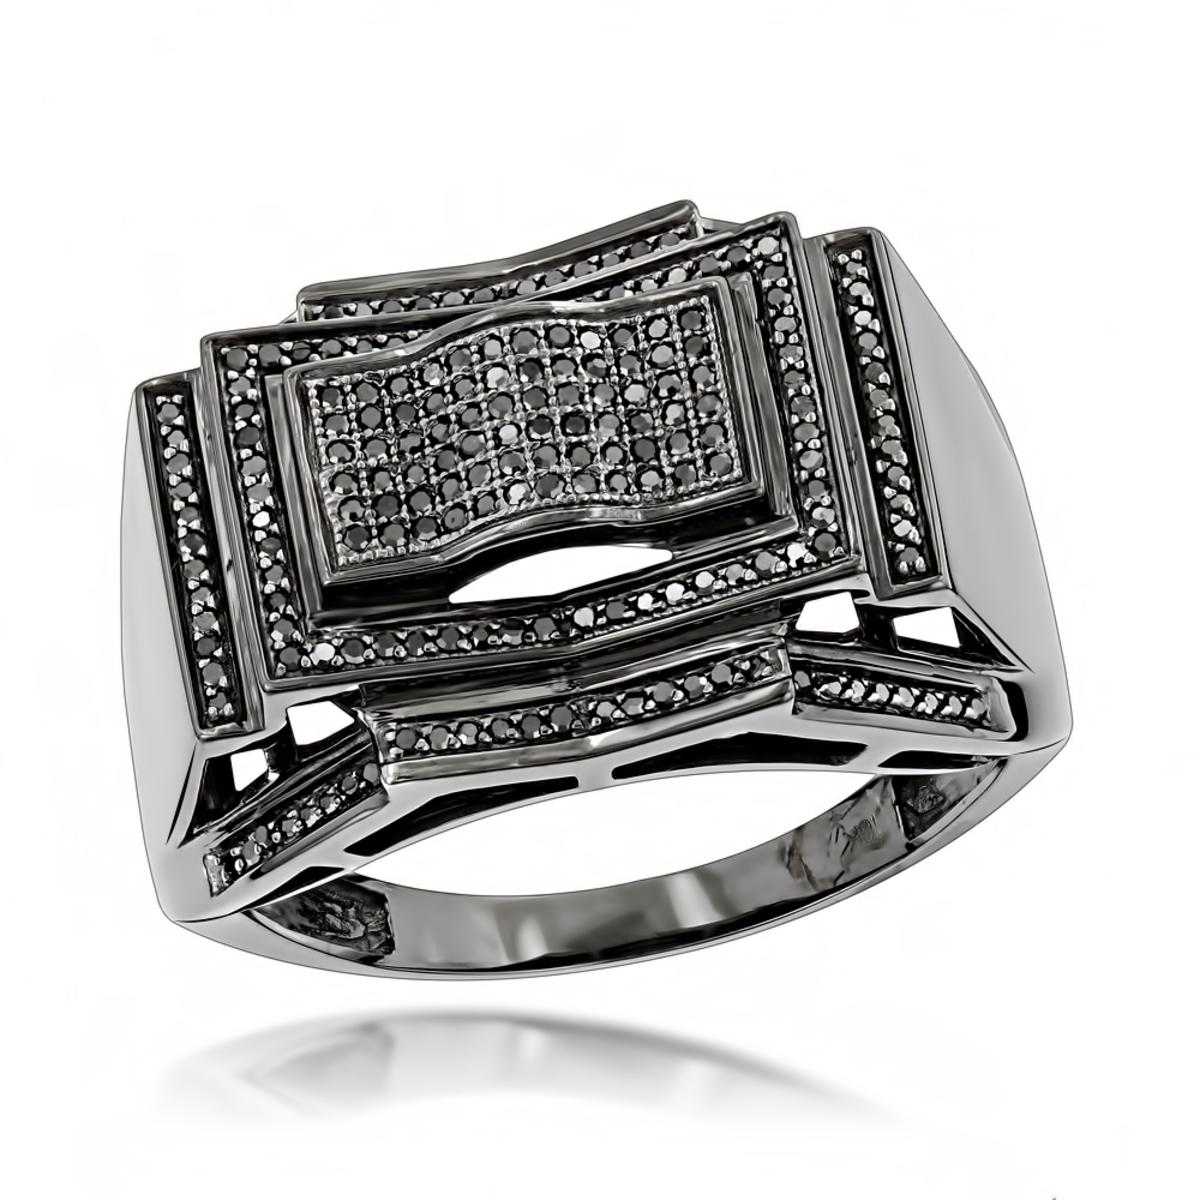 Mens Black Diamond Ring 0.5 ct 10K